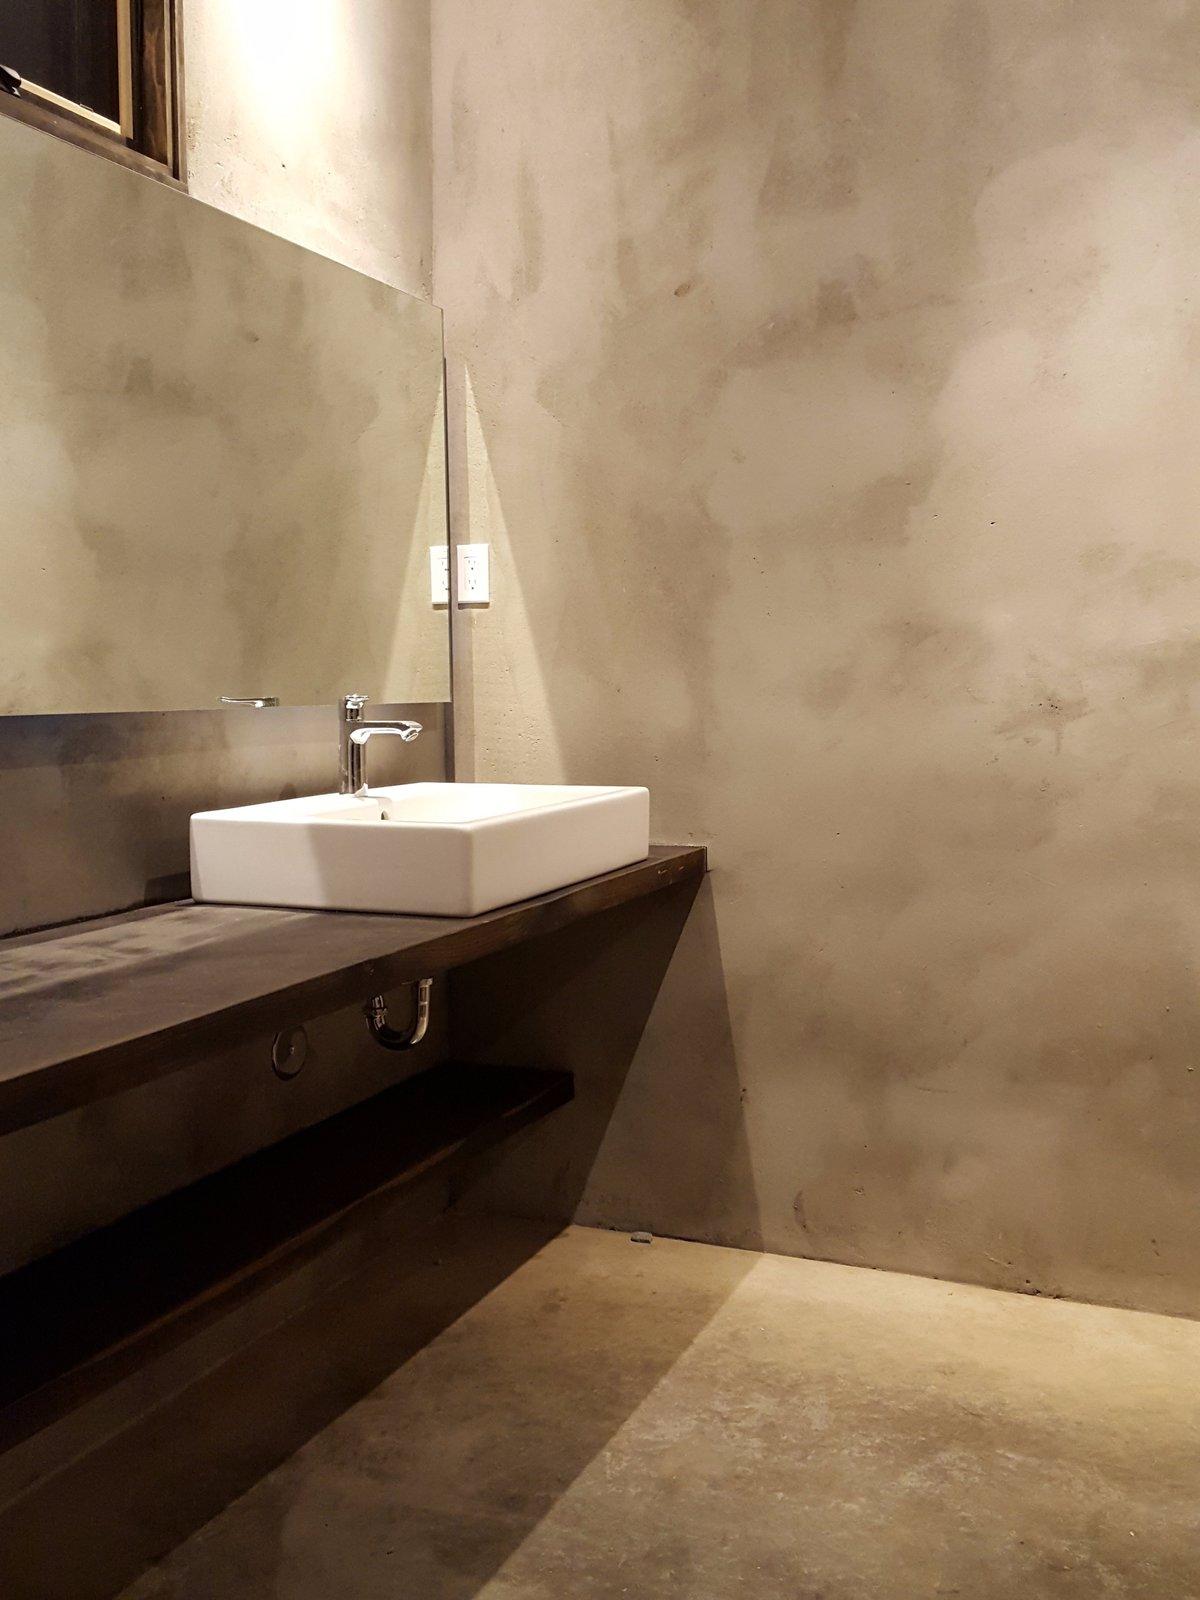 Bath Room, Wood Counter, Concrete Floor, Vessel Sink, Ceiling Lighting, Recessed Lighting, and Concrete Wall Master Bath Vanity  Santa Fe East Side Home by Ju Tan